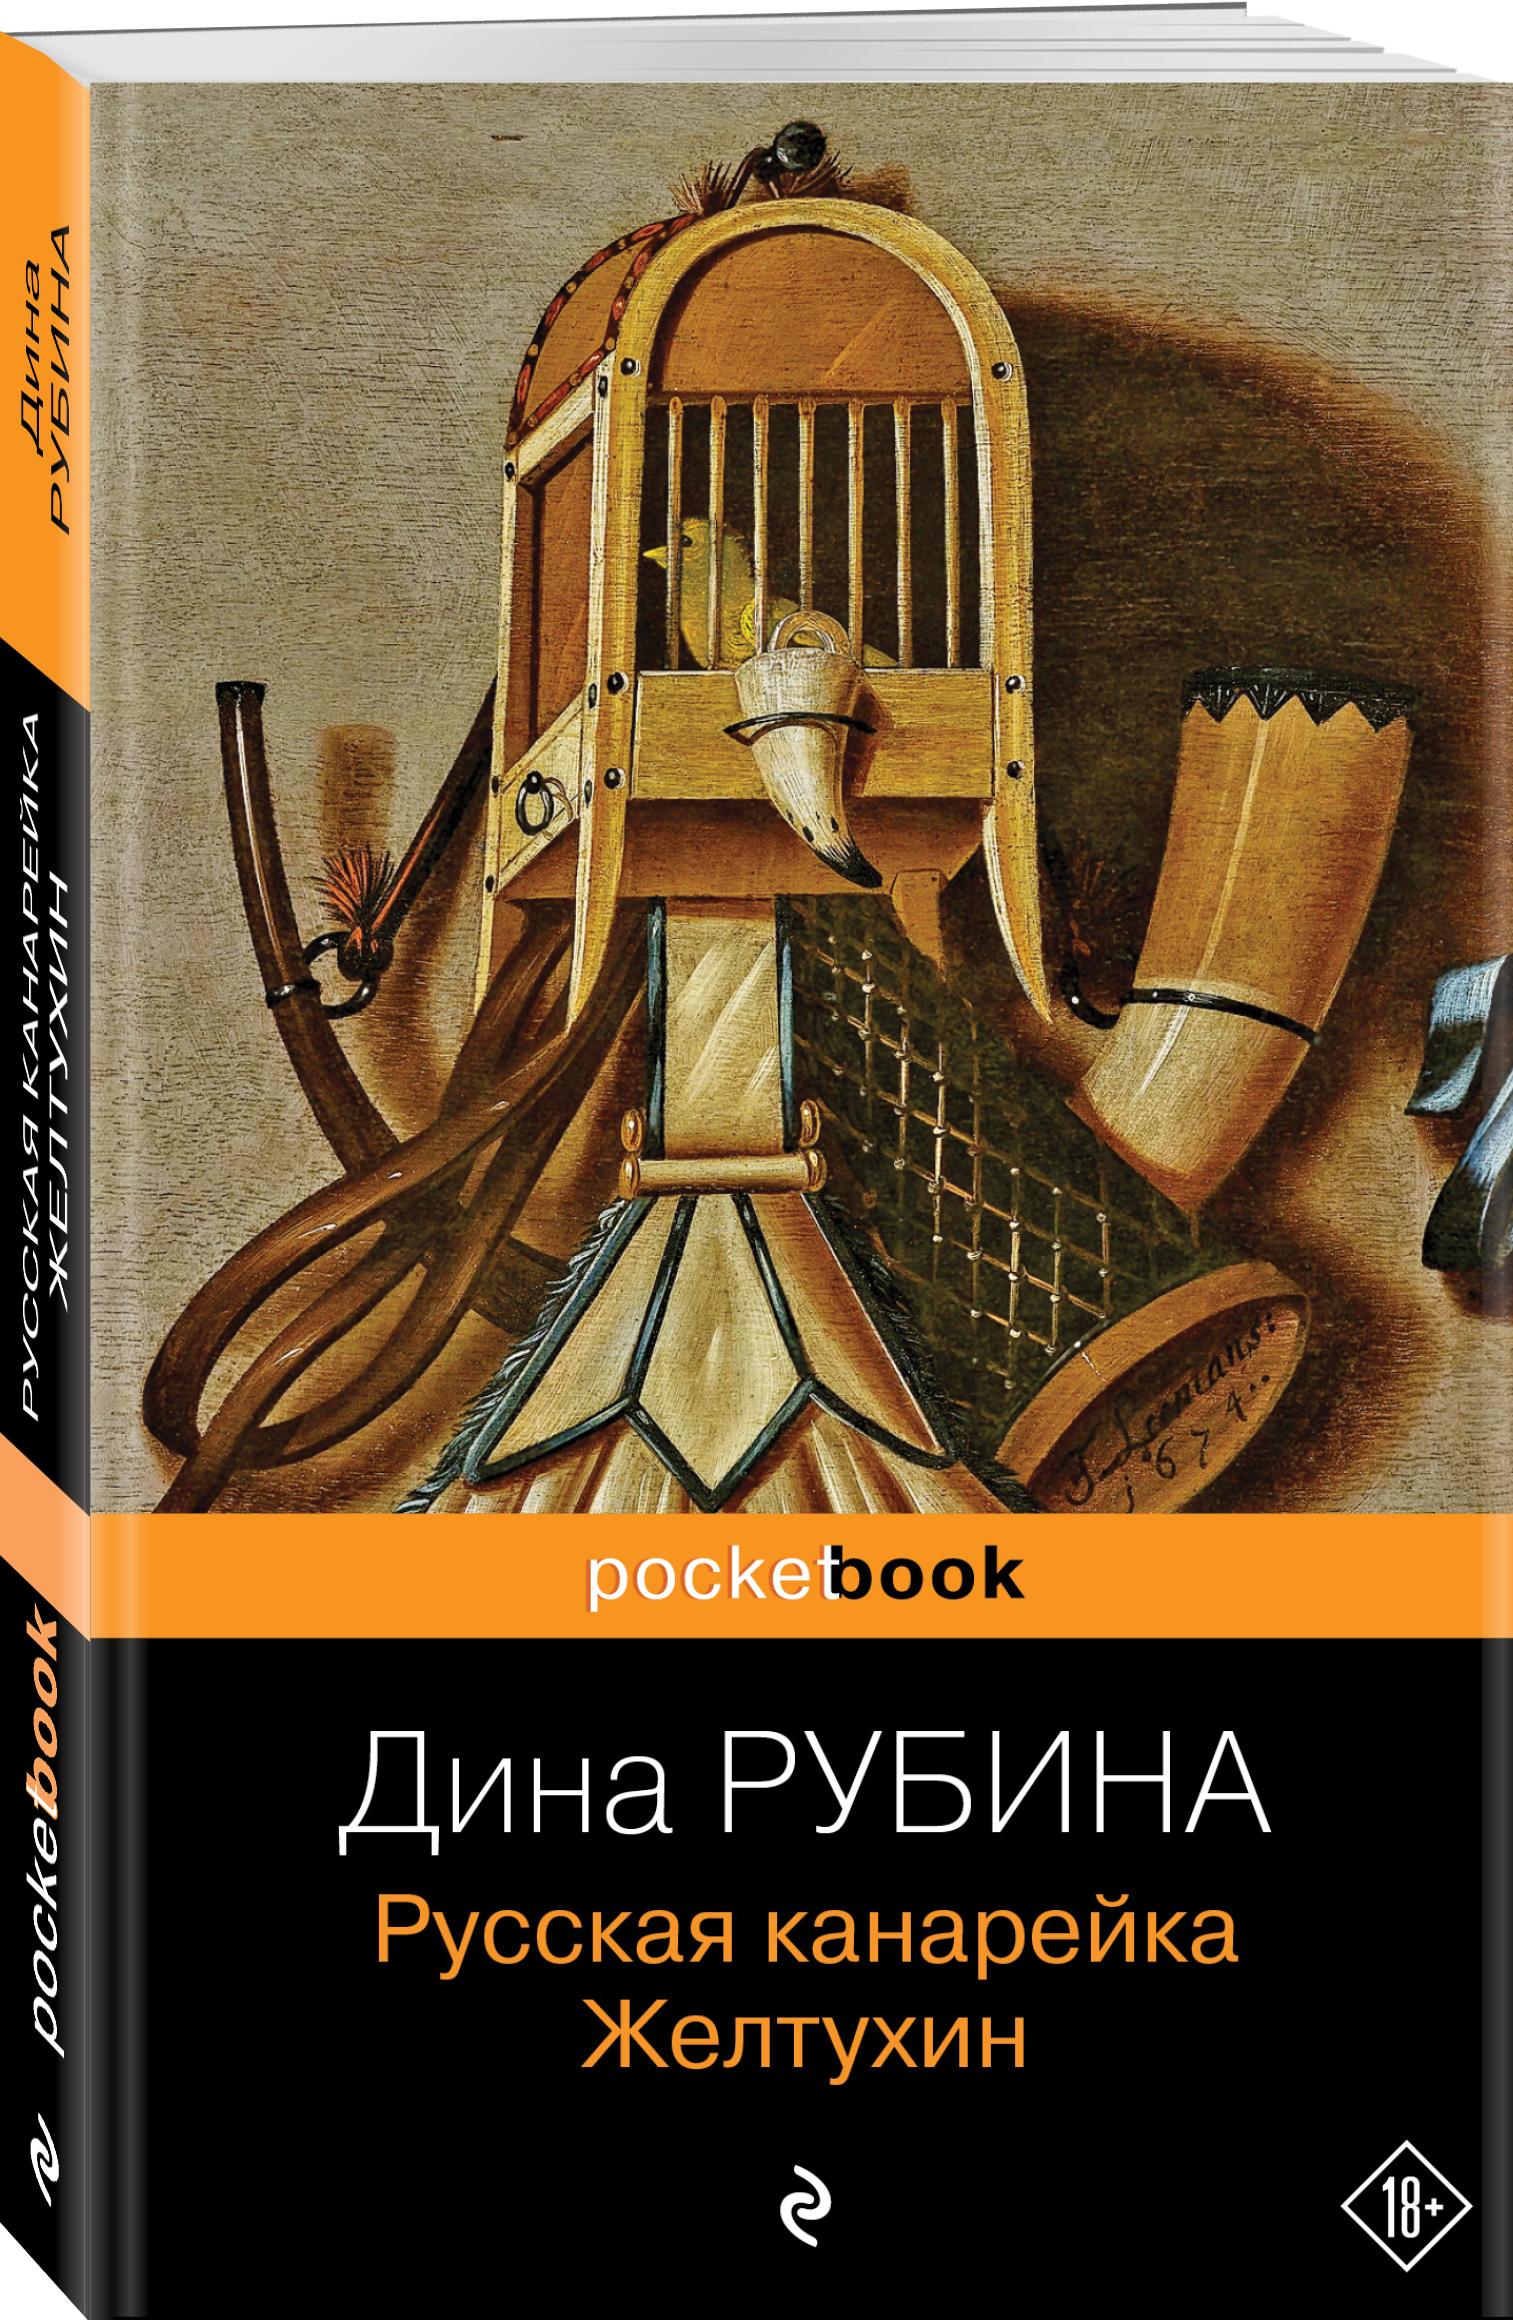 Дина Рубина Русская канарейка. Желтухин